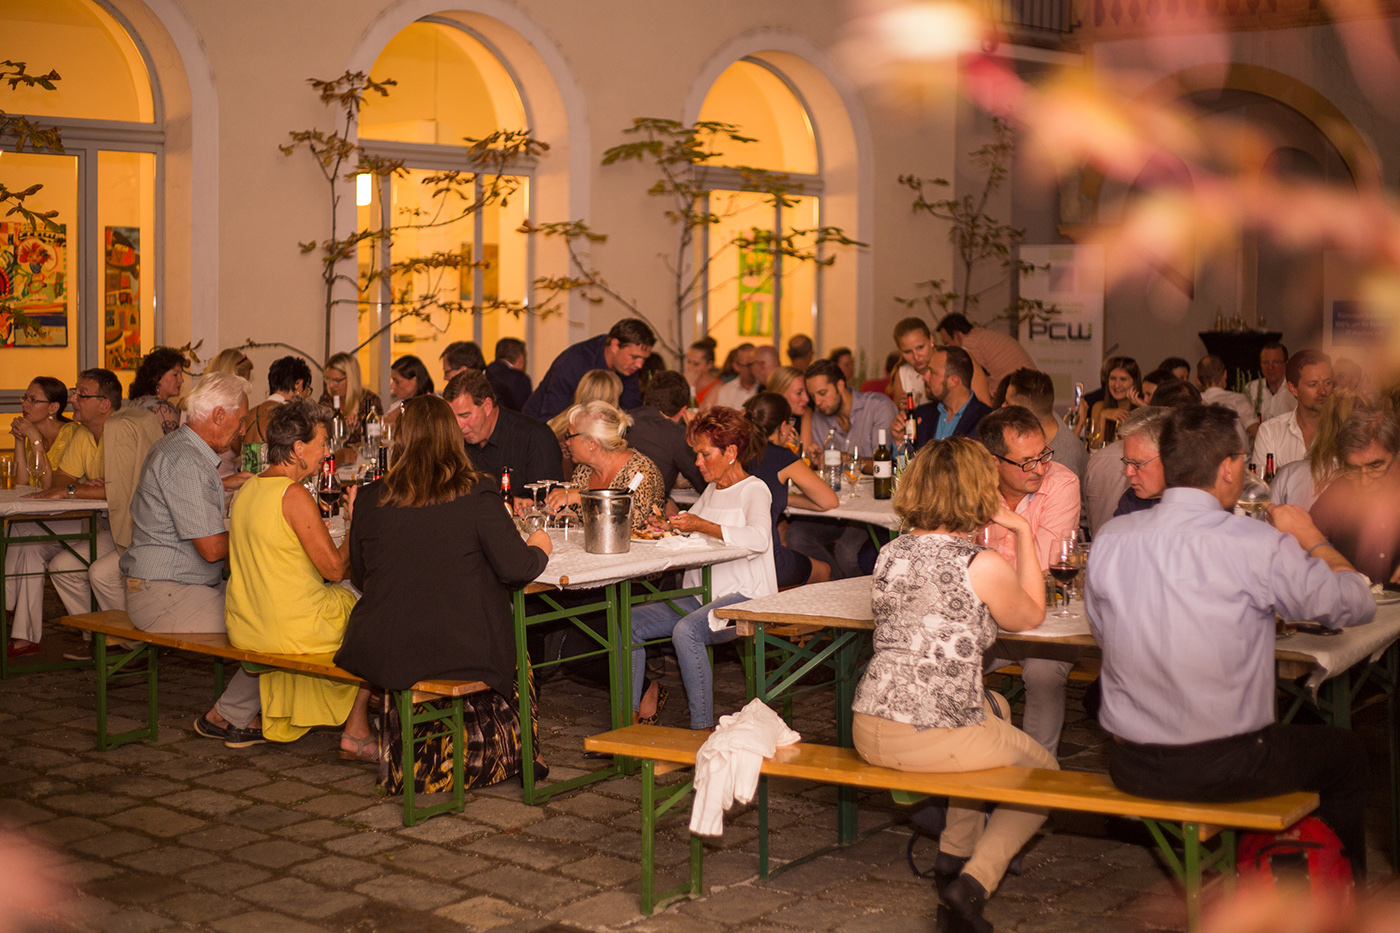 pc-web Sommerfest 2016 am St. Ulrichsplatz